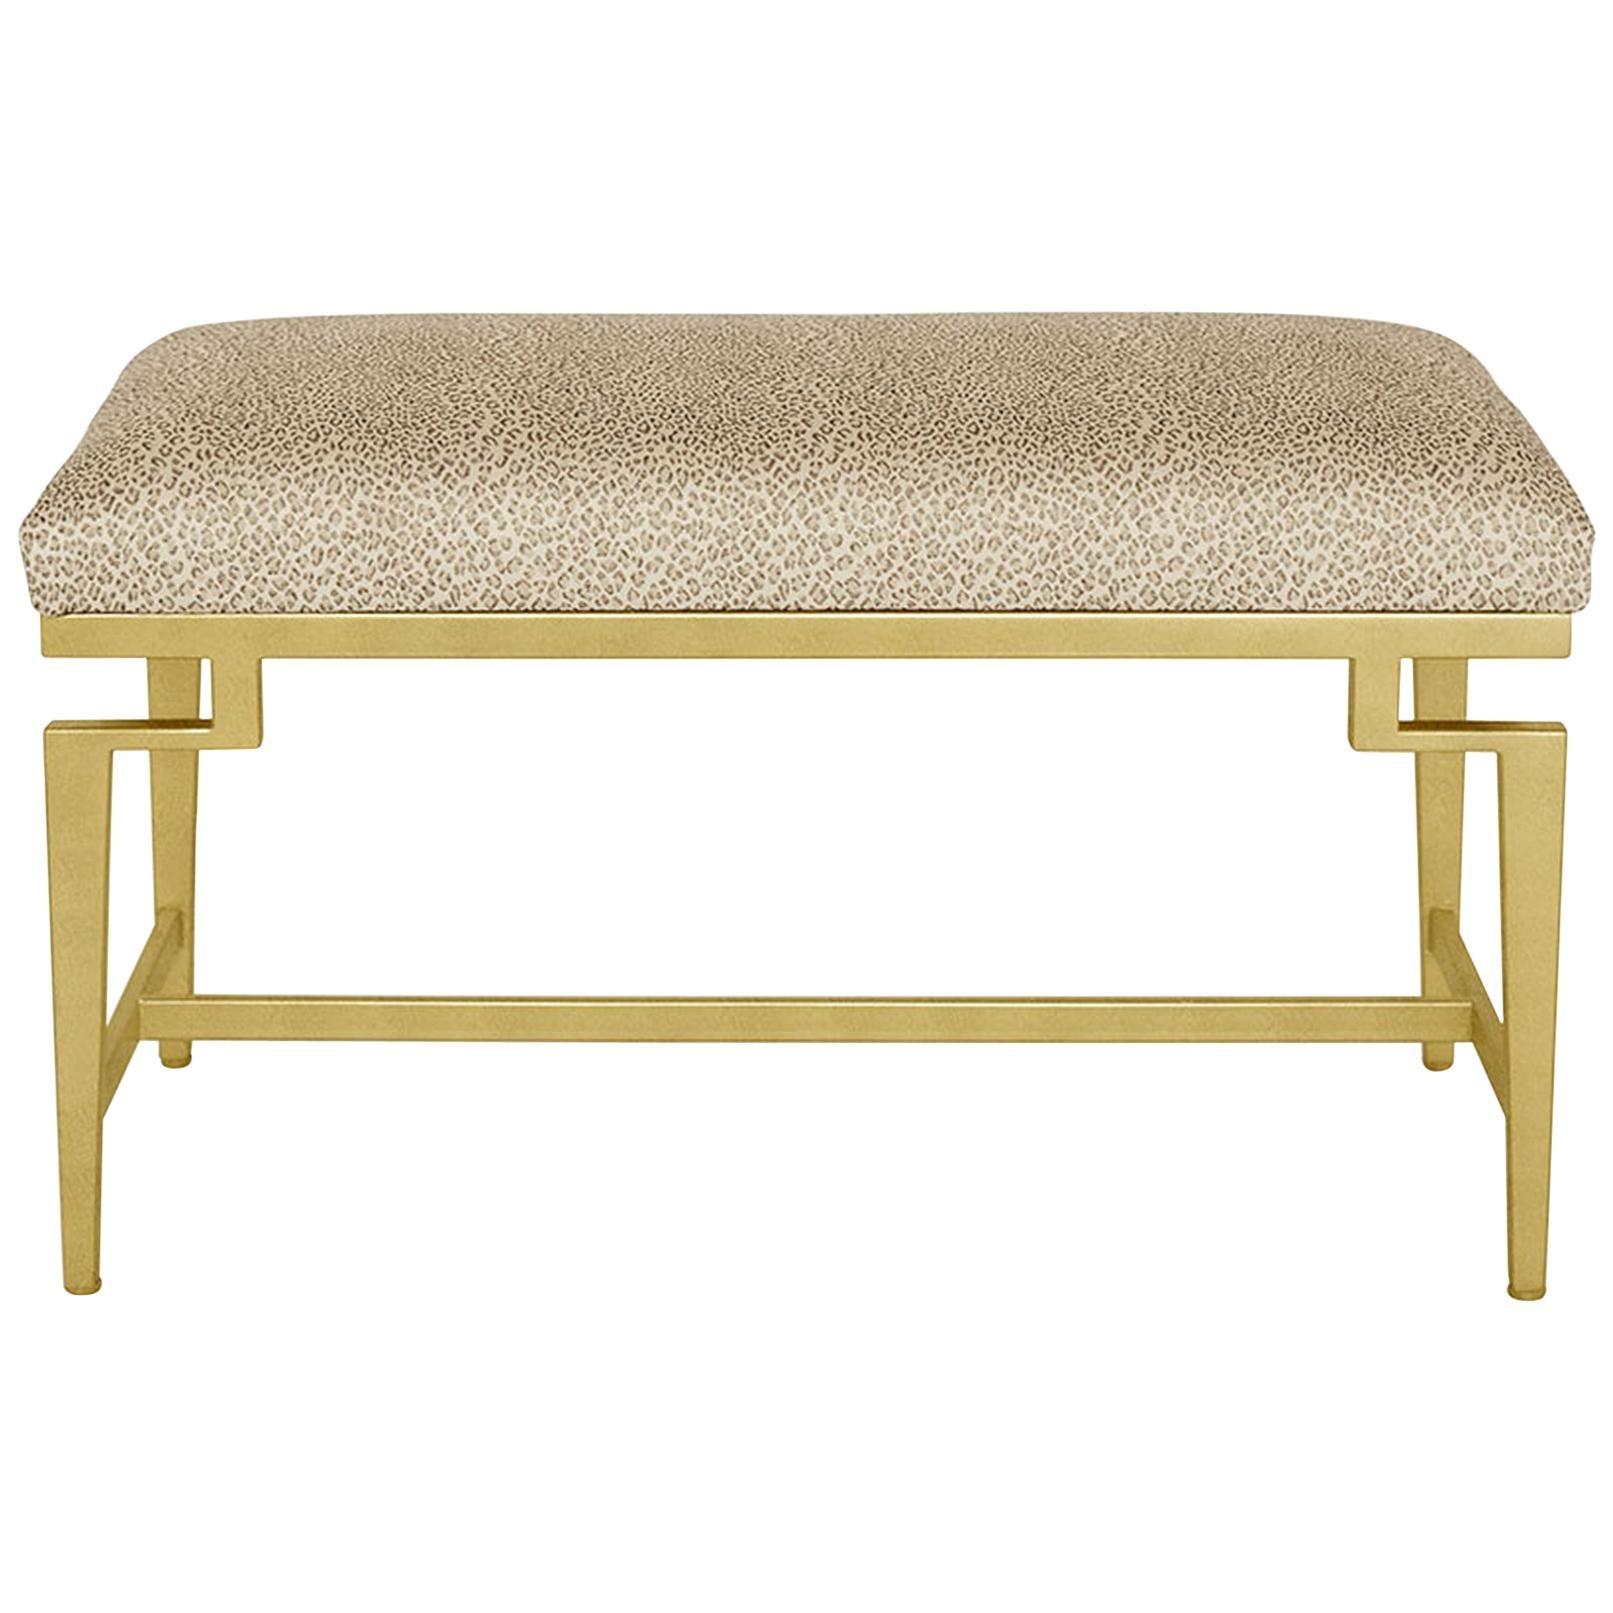 Gold Leaf Seating - 157 For Sale at 1stdibs